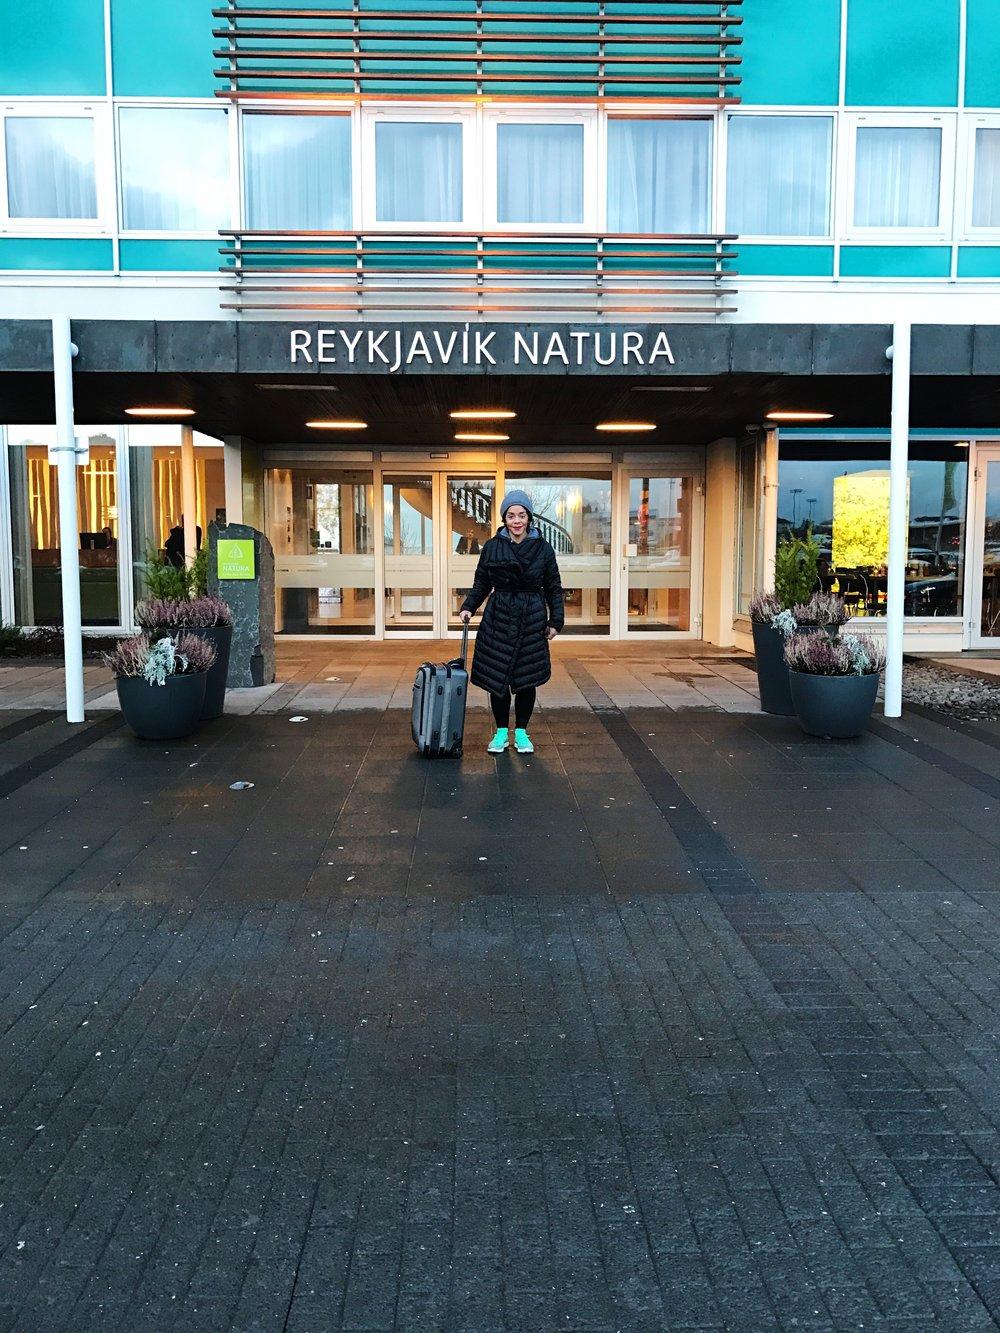 rockyorizos-hotelreykjavik7